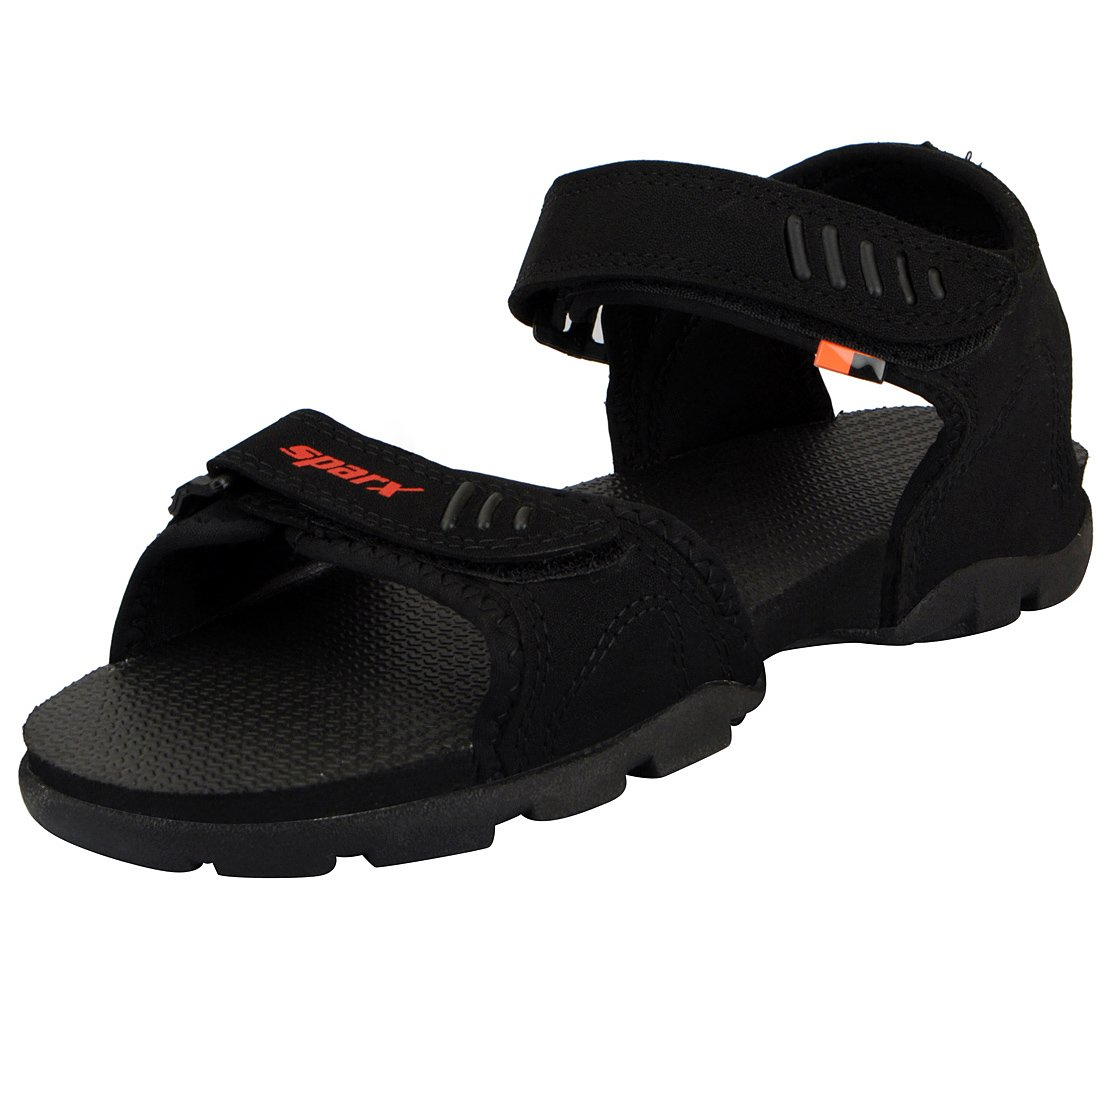 Bata Men's Sandals Under 1000 Rupees